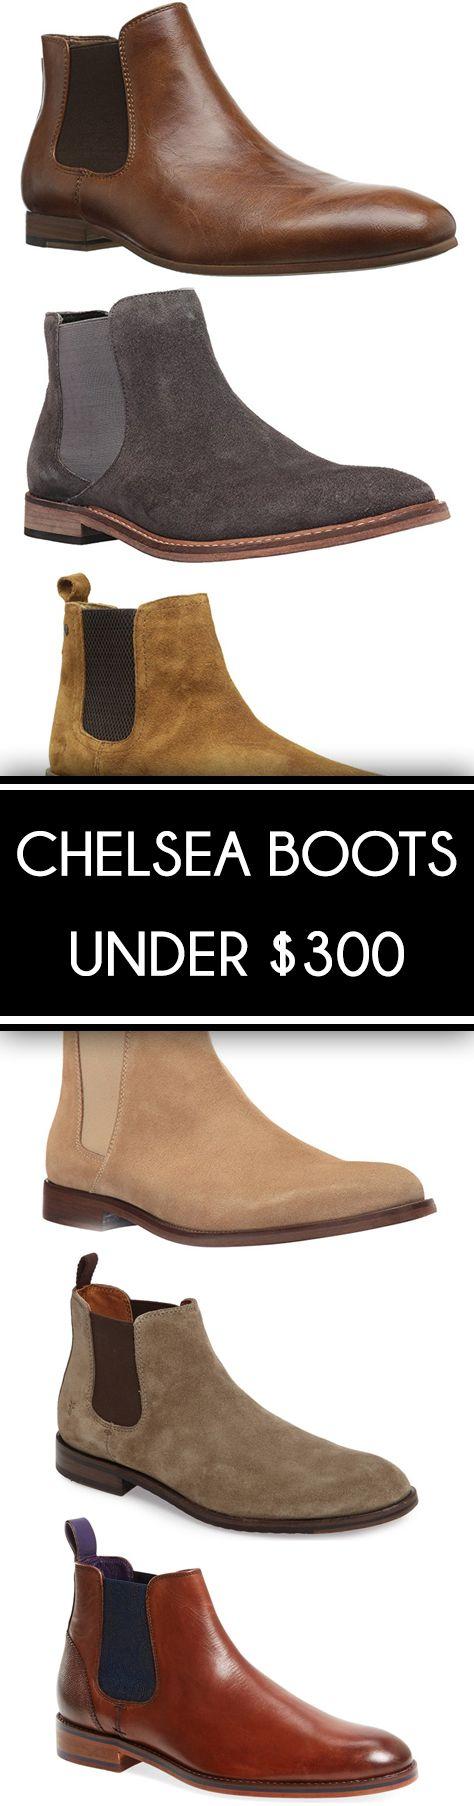 Chelsea Boots for Men Under $300